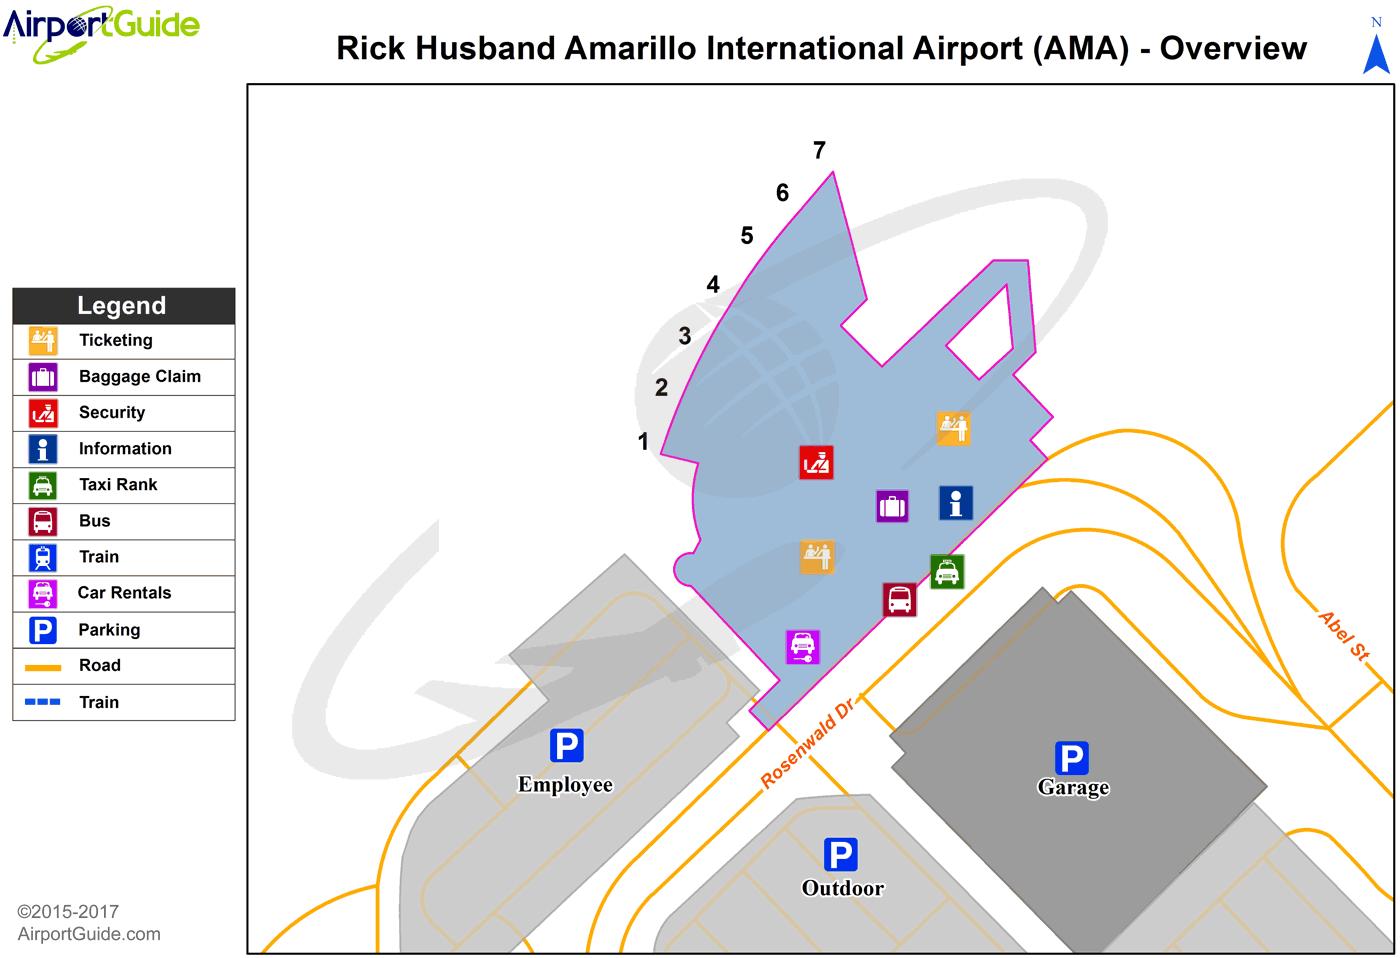 Amarillo Airport Map Amarillo   Rick Husband Amarillo International (AMA) Airport